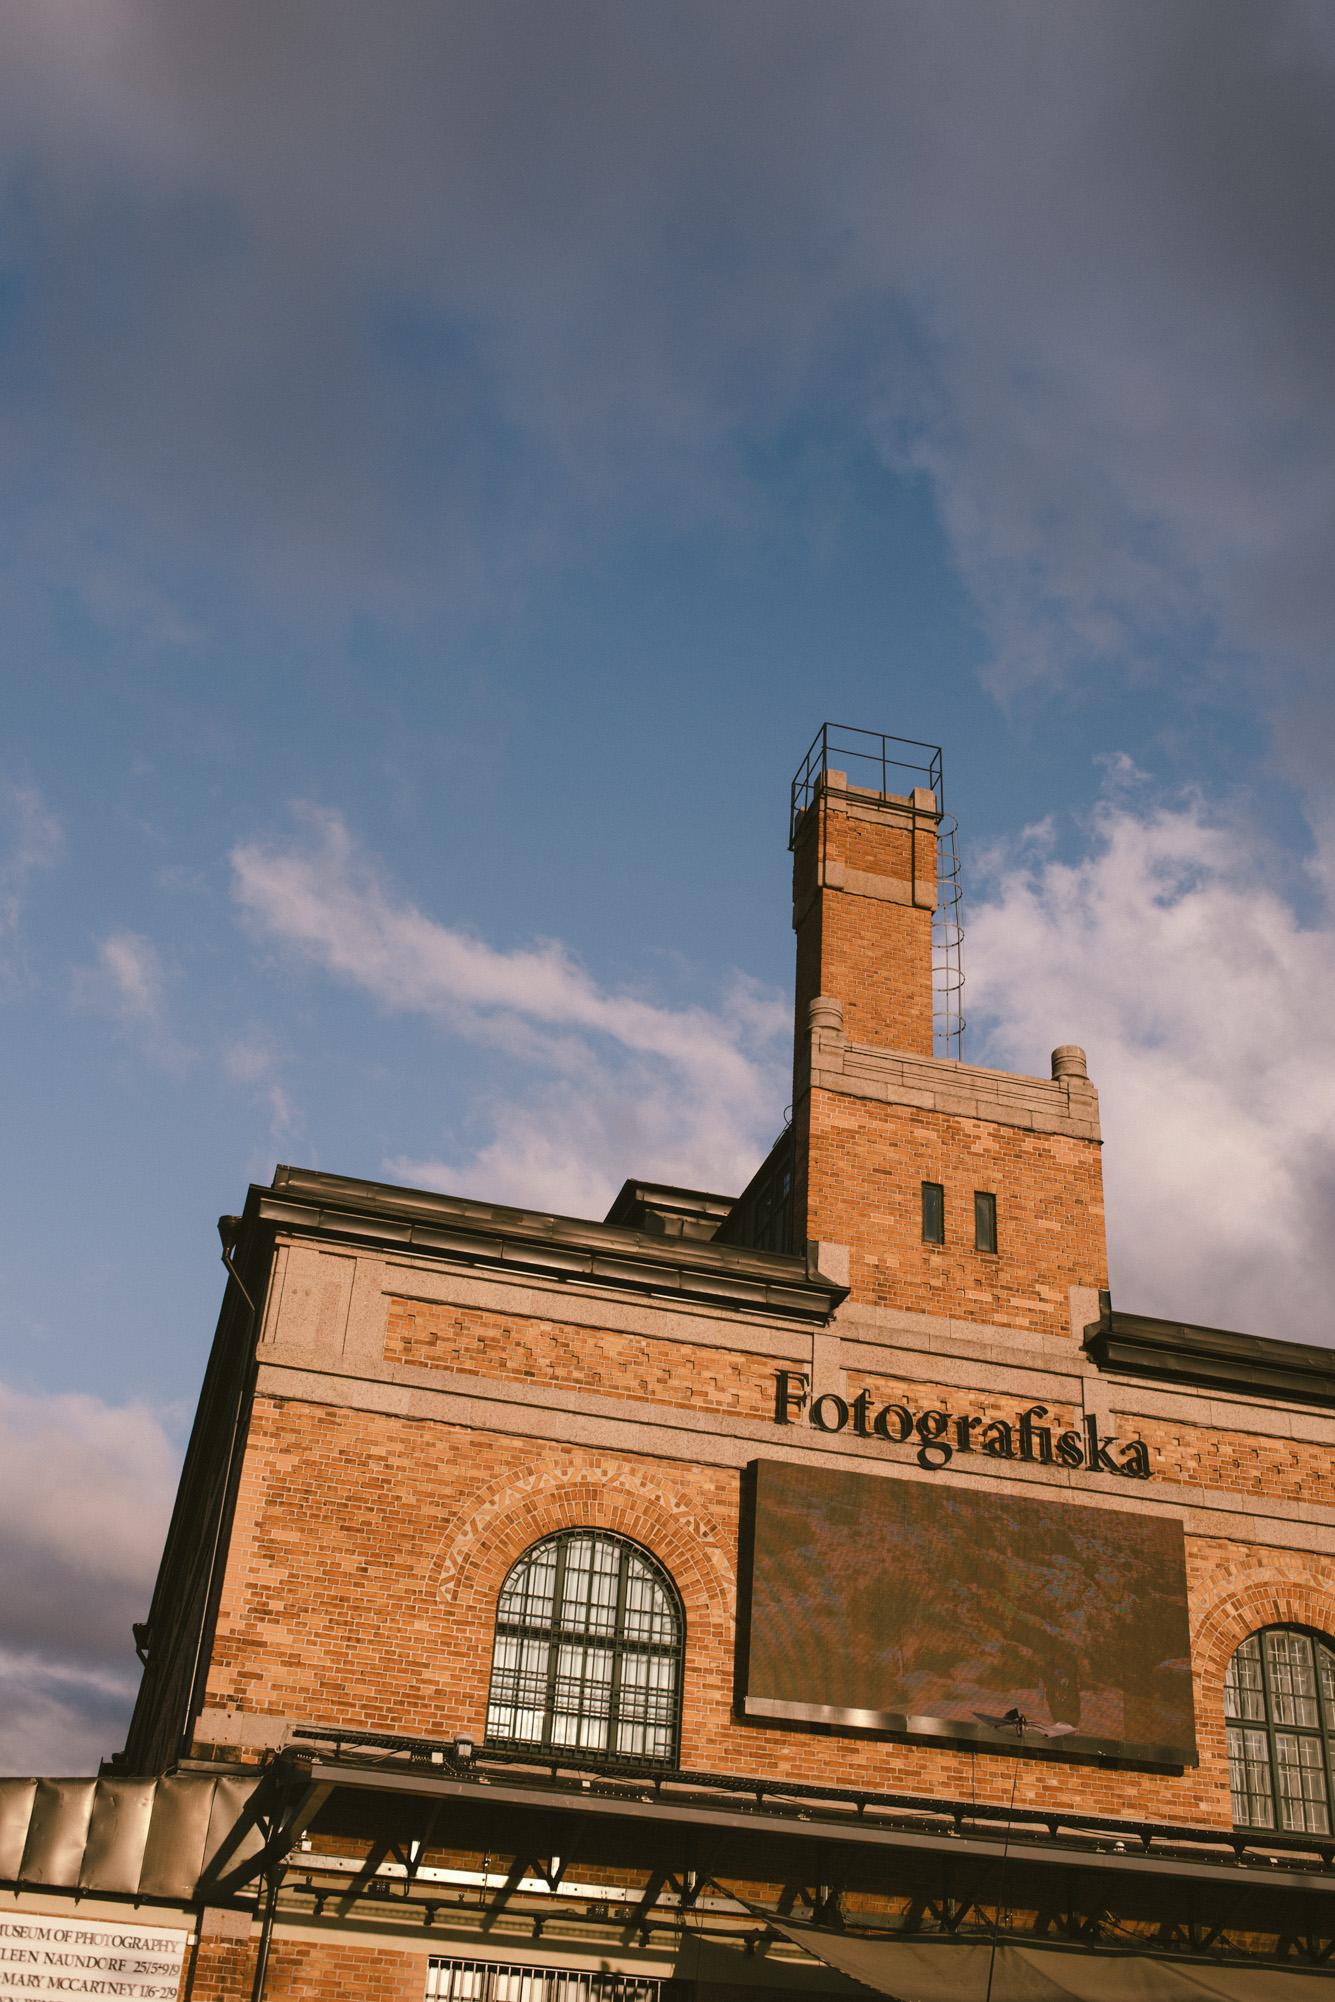 stockholm-kids-cityguide-conbotasdeagua-21.jpg